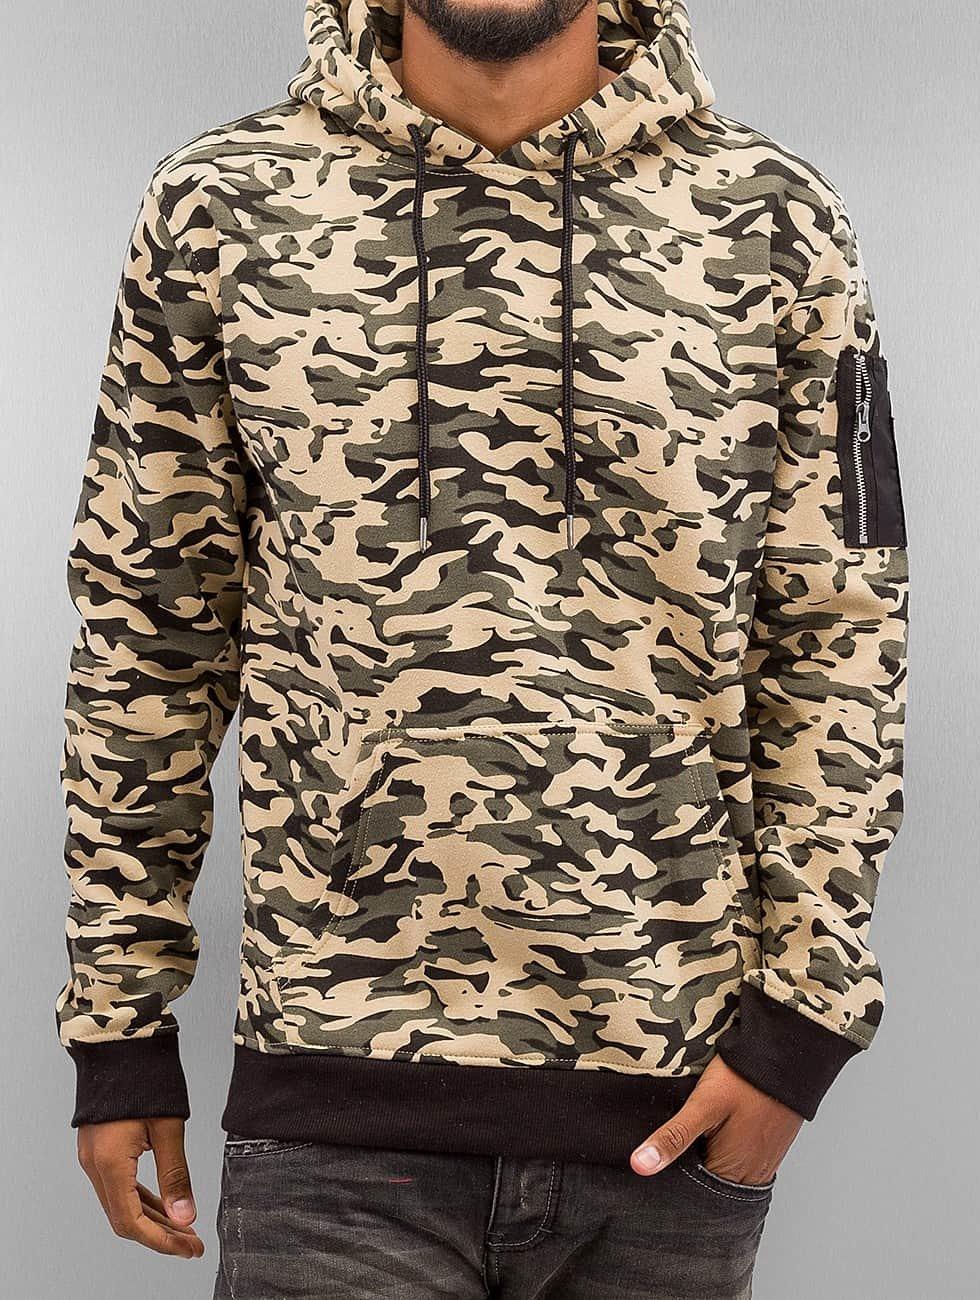 Urban Classics Hoody Sweat Camo Bomber camouflage